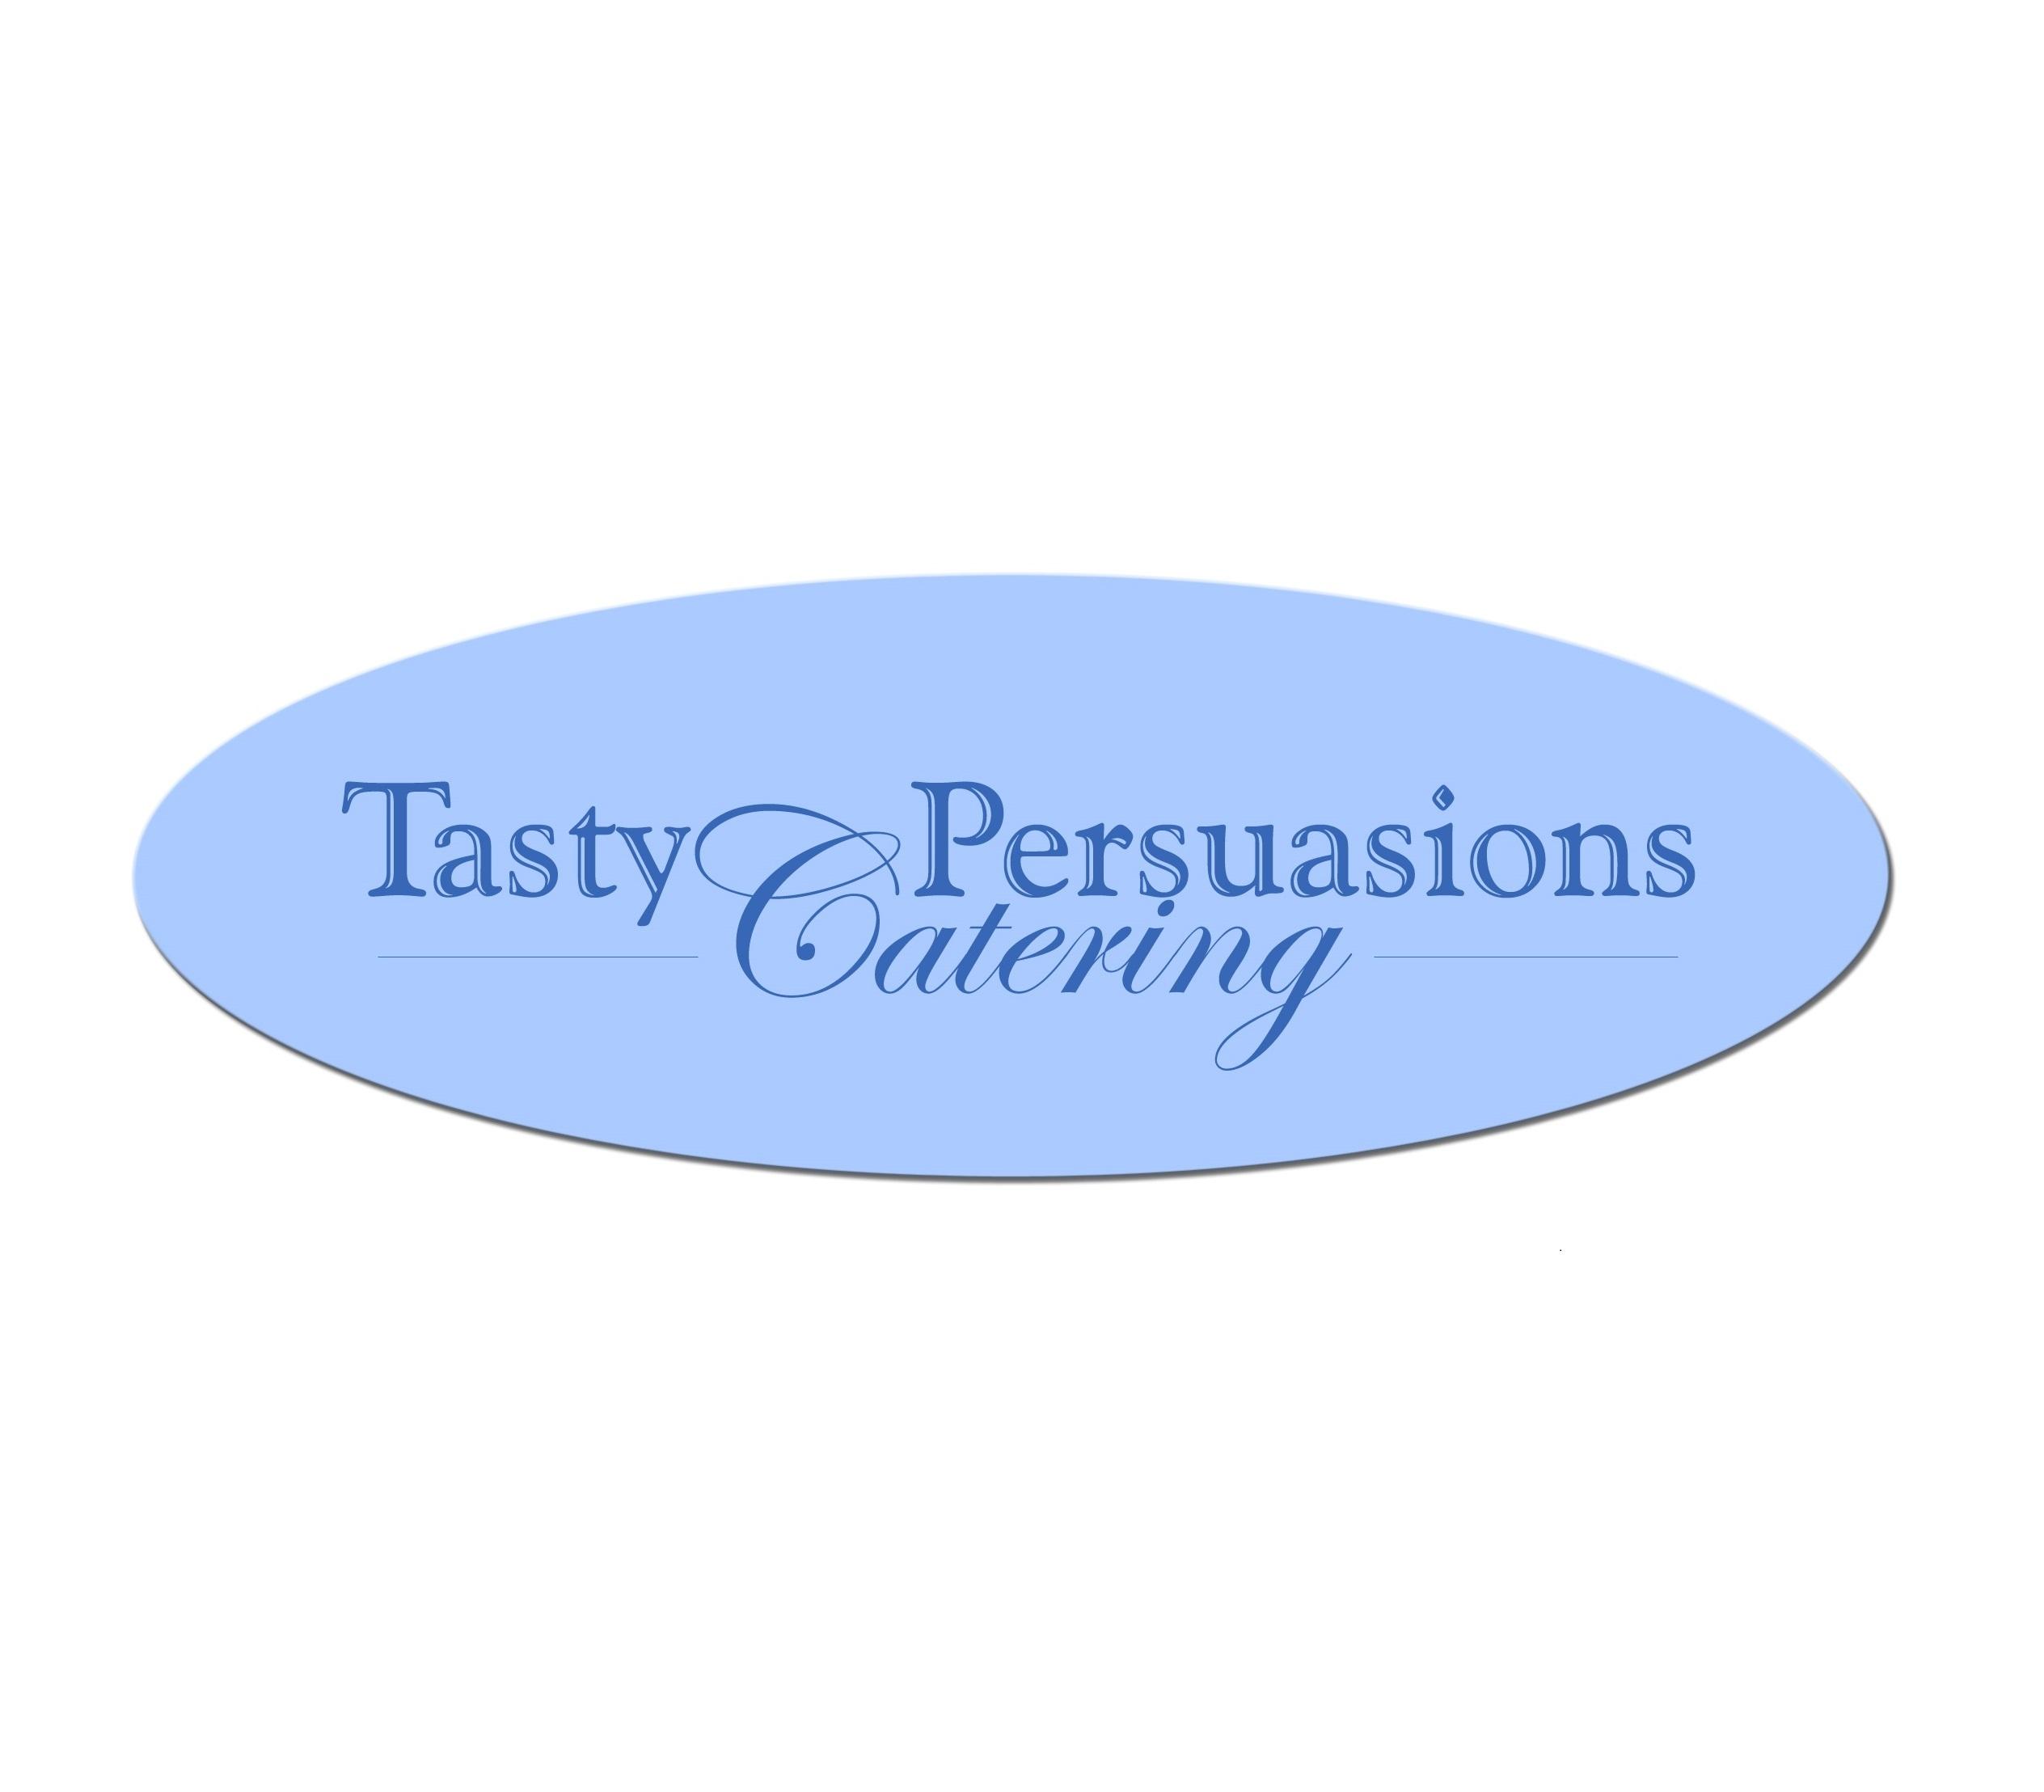 Tasty Persuasions Catering